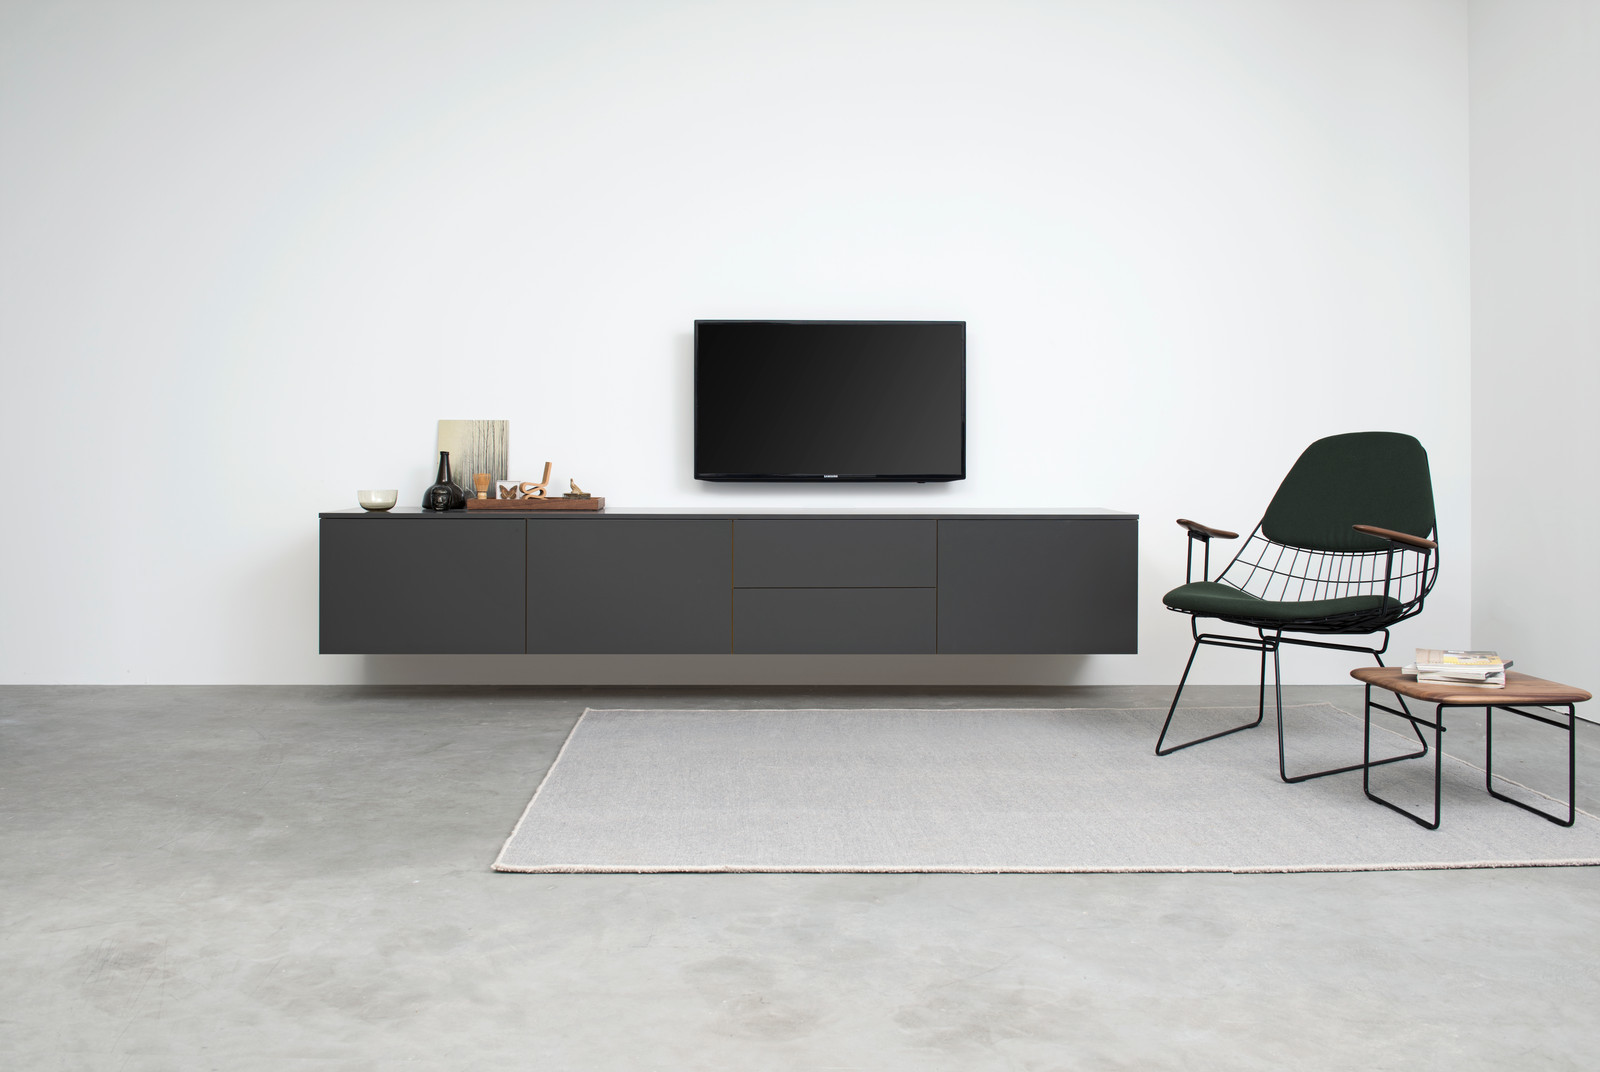 Boomerang Tv Meubel.Pastoe Tv Meubel Meuble Gallery Collection